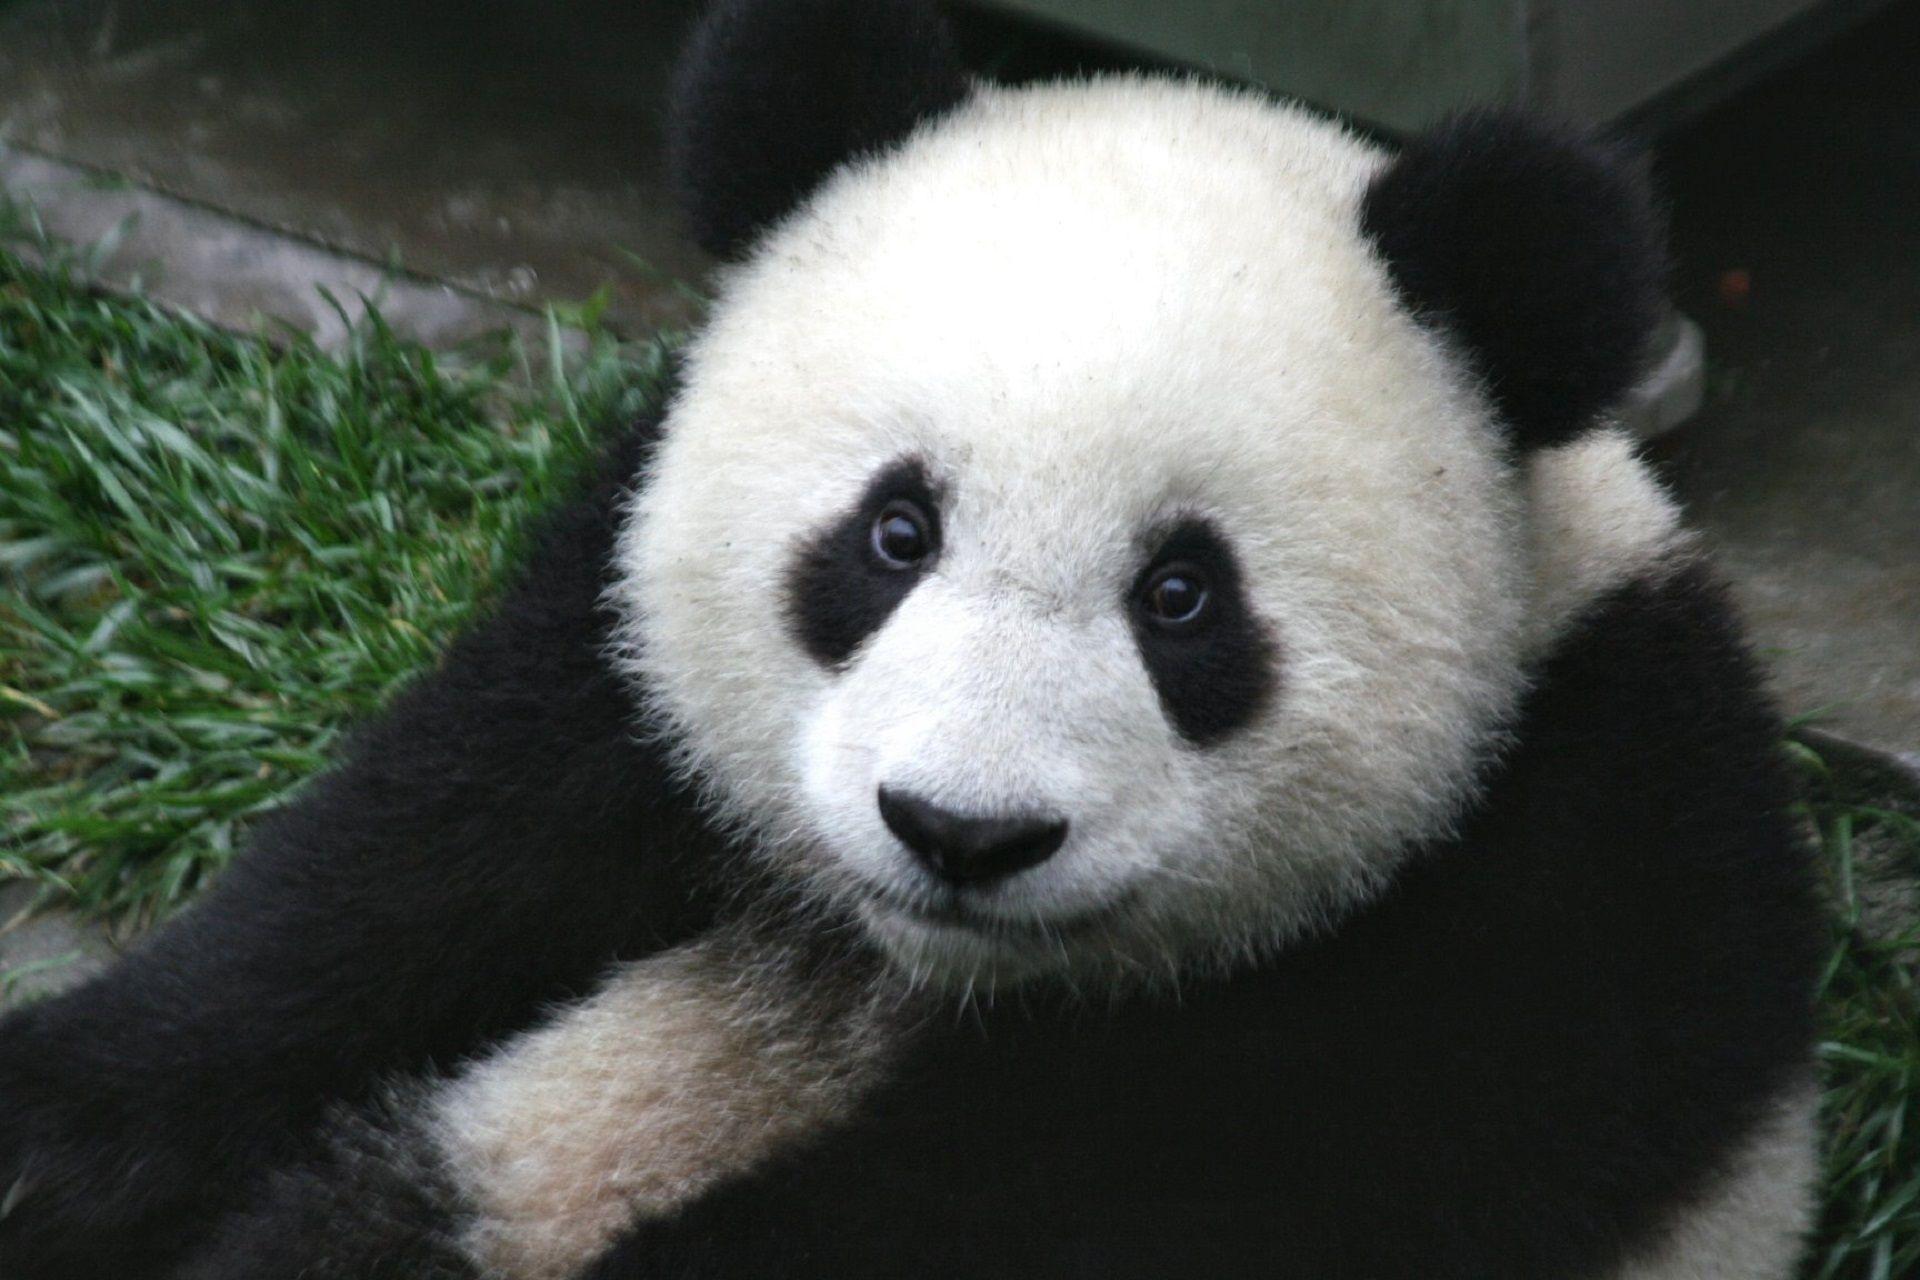 animali-esotici-04-panda